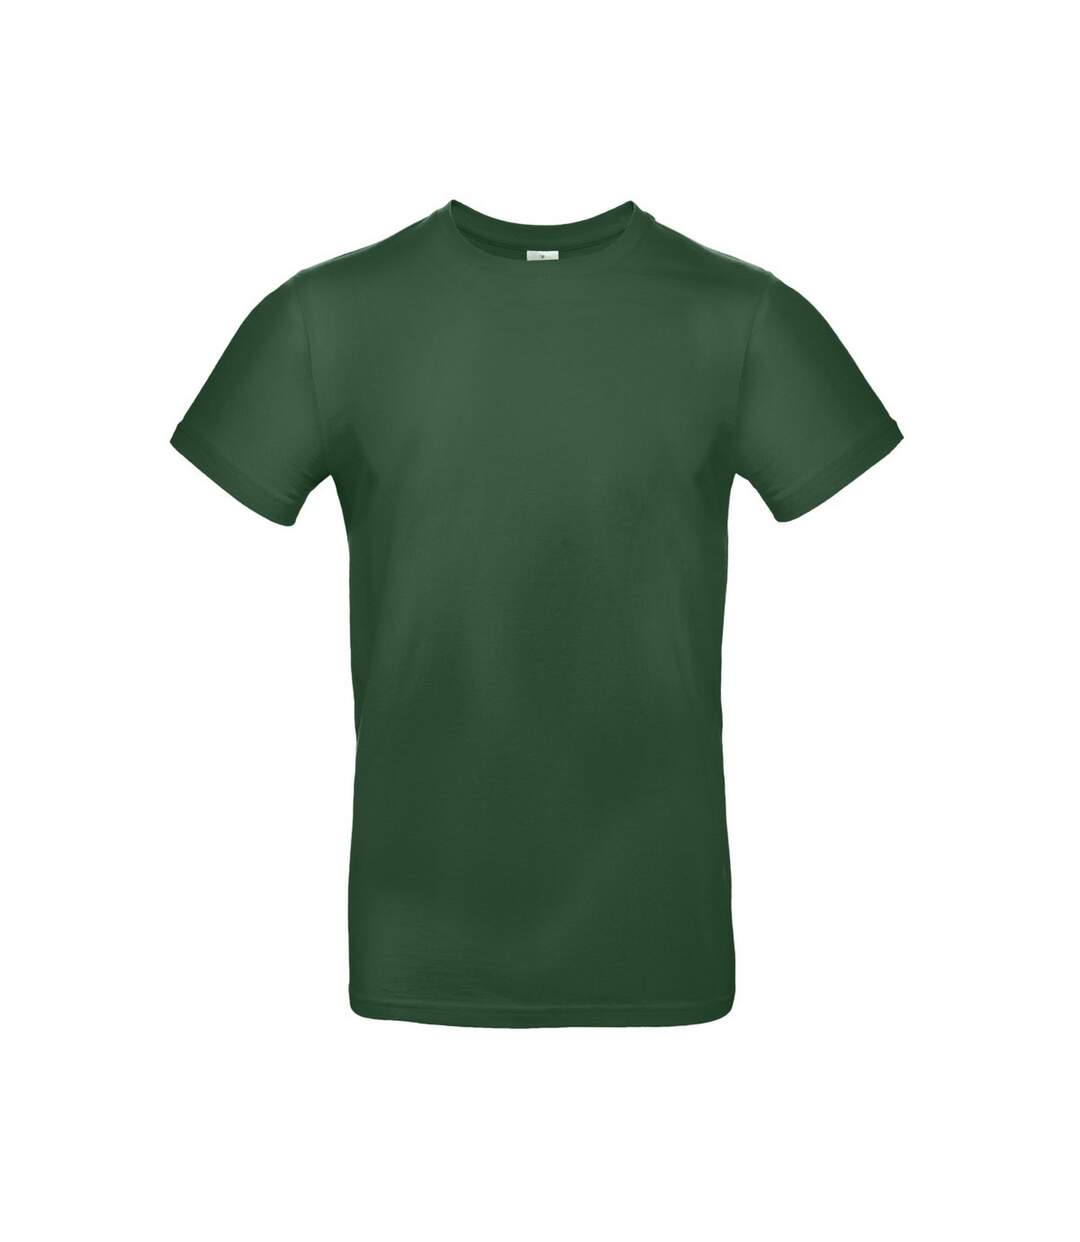 B&C Mens #E190 Tee (Bottle Green) - UTBC3911